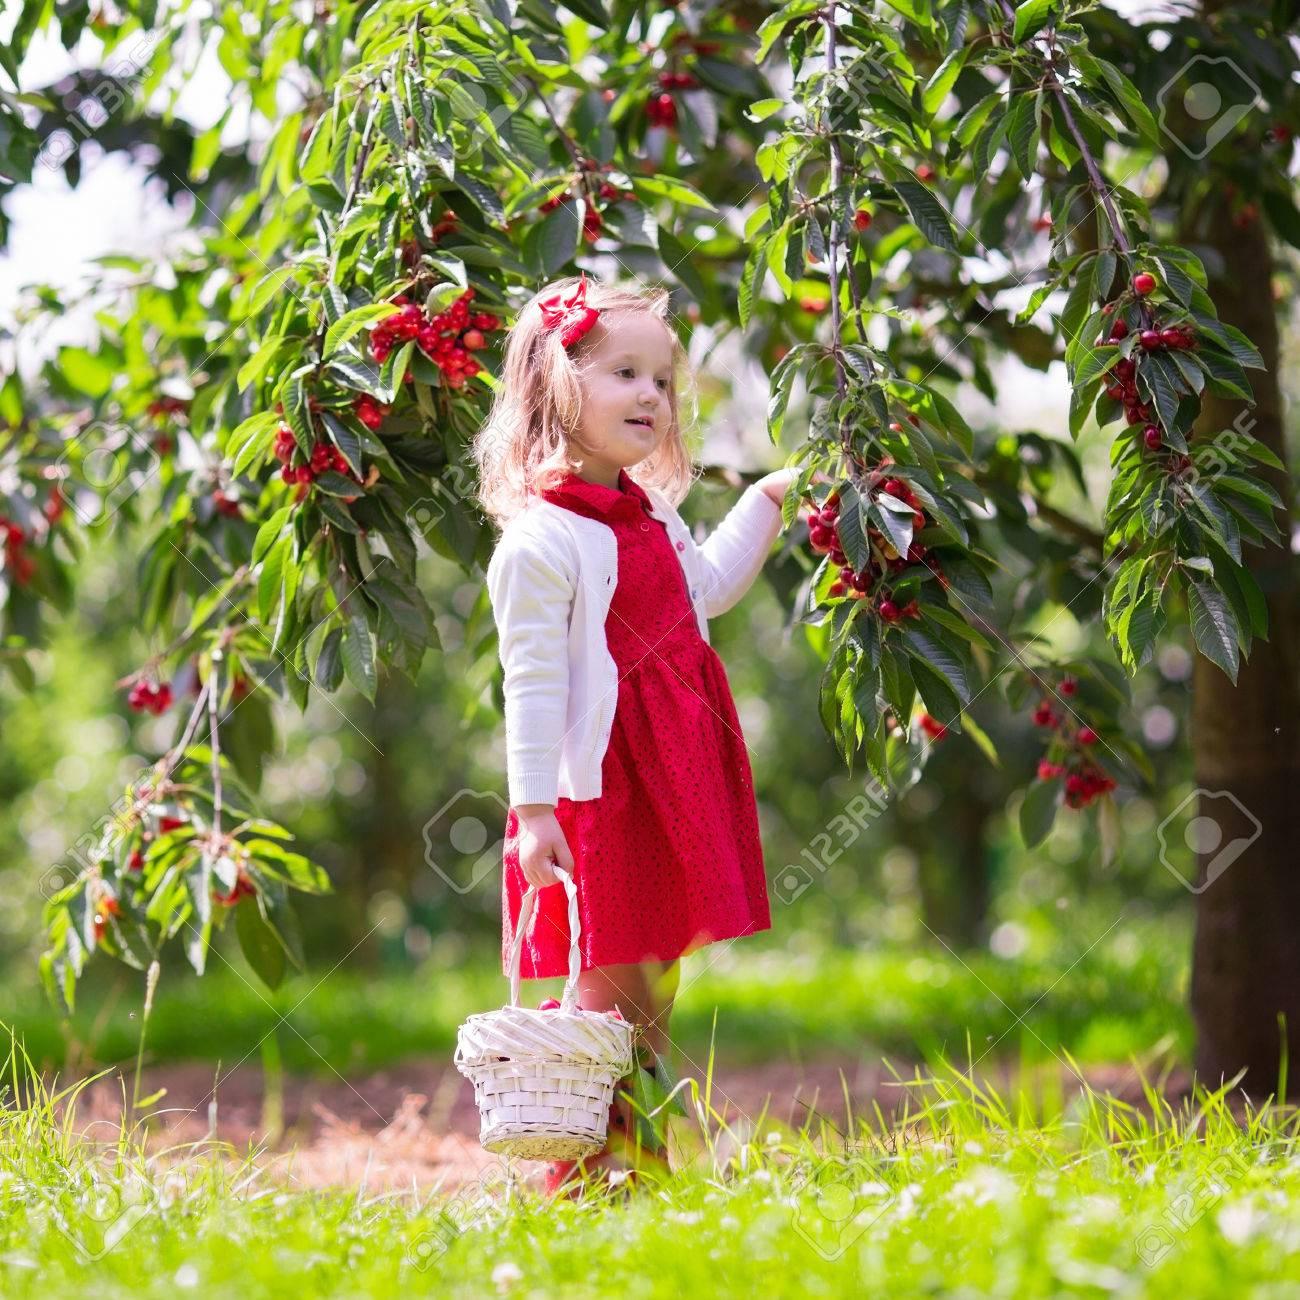 Kids Picking Cherry On A Fruit Farm. Children Pick Cherries In ... for Fruit Farm Photography  568zmd